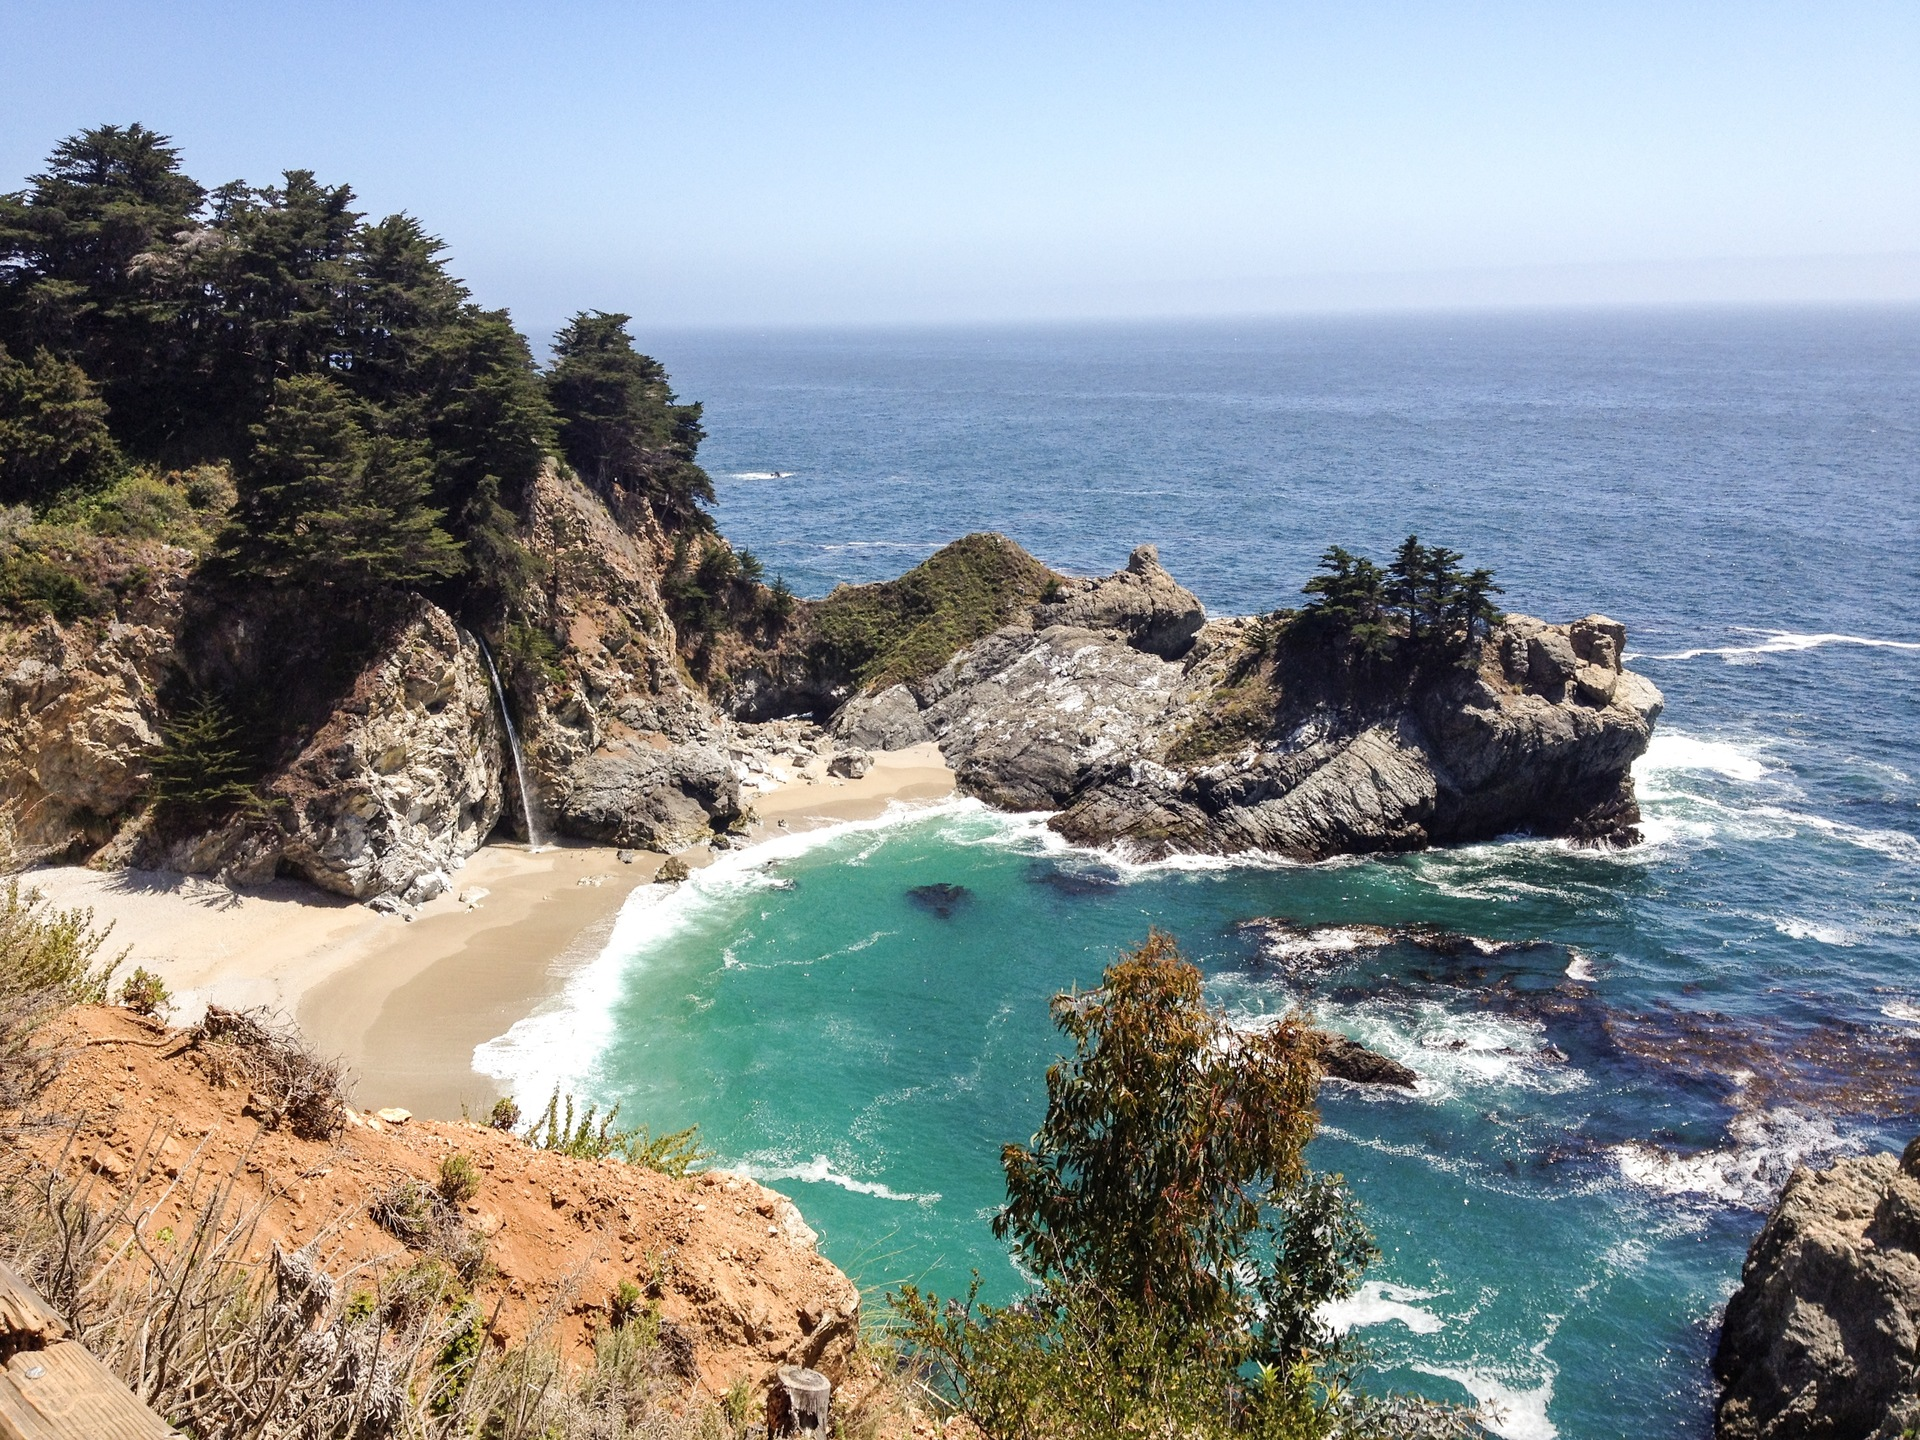 Scenic view of nature   sea, seascape, ocean, beach